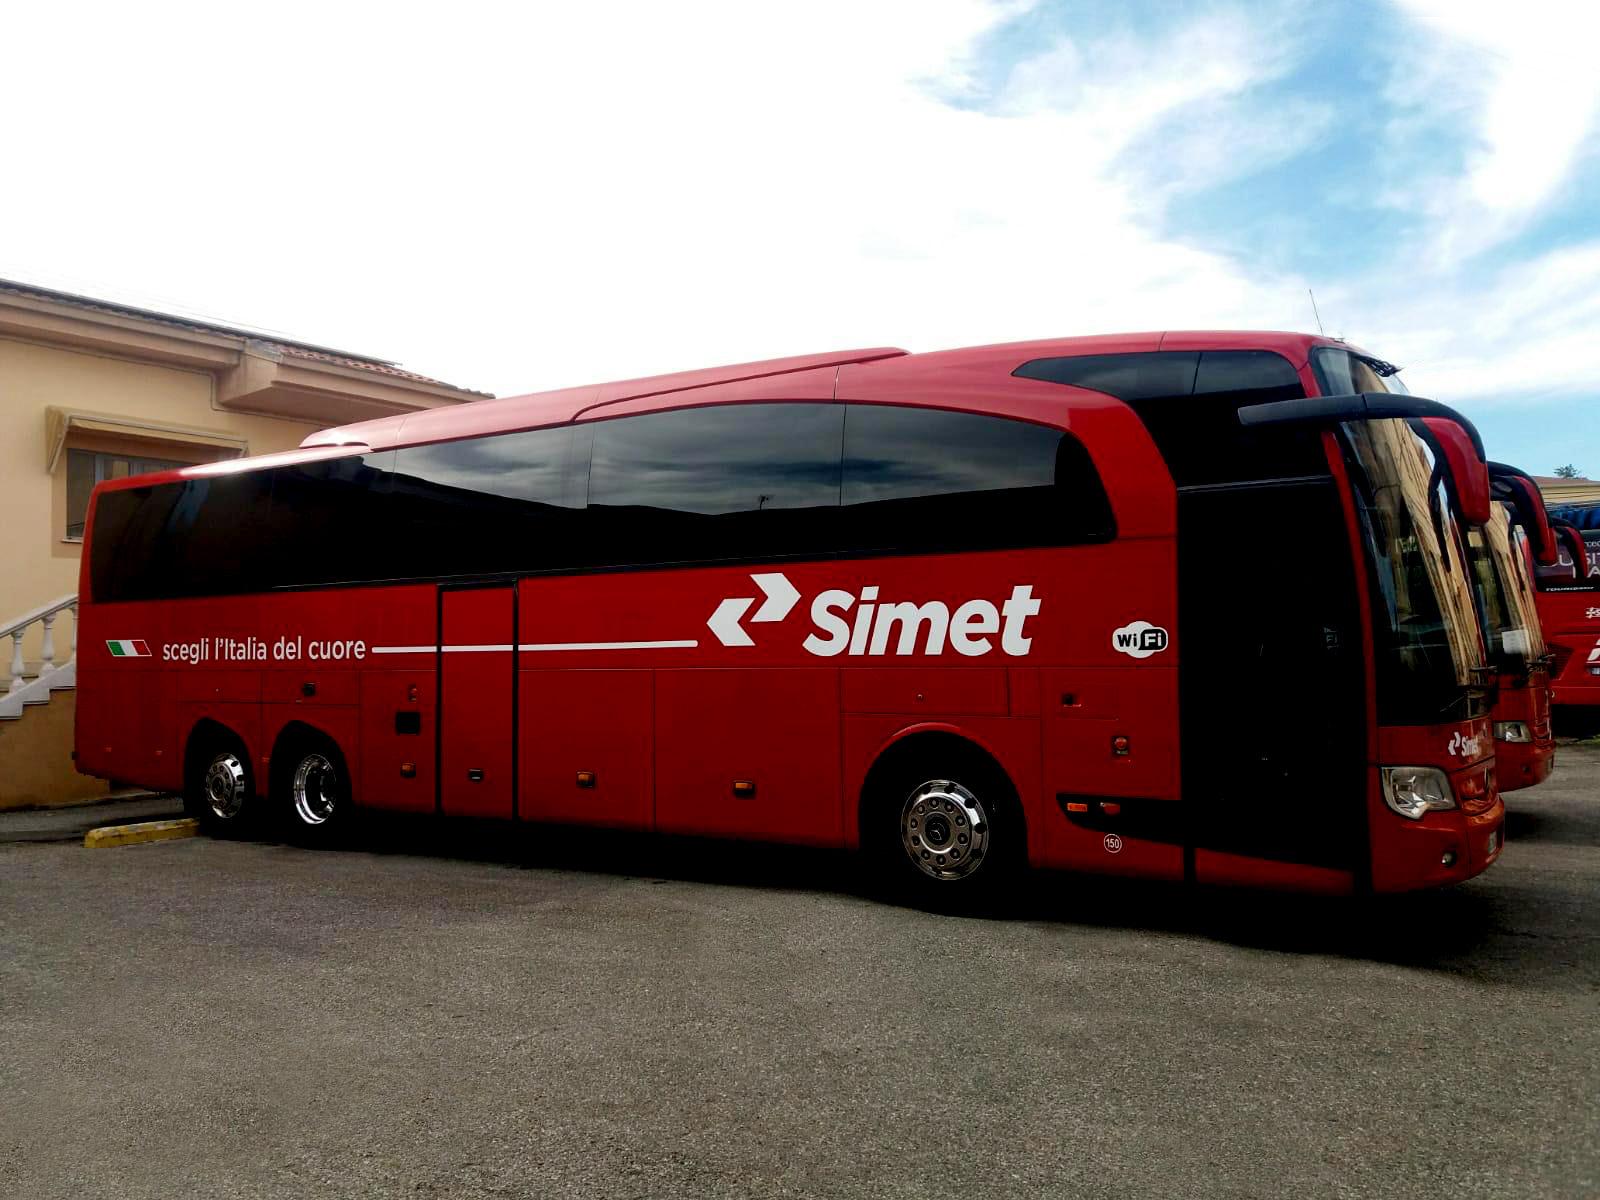 Simet bus